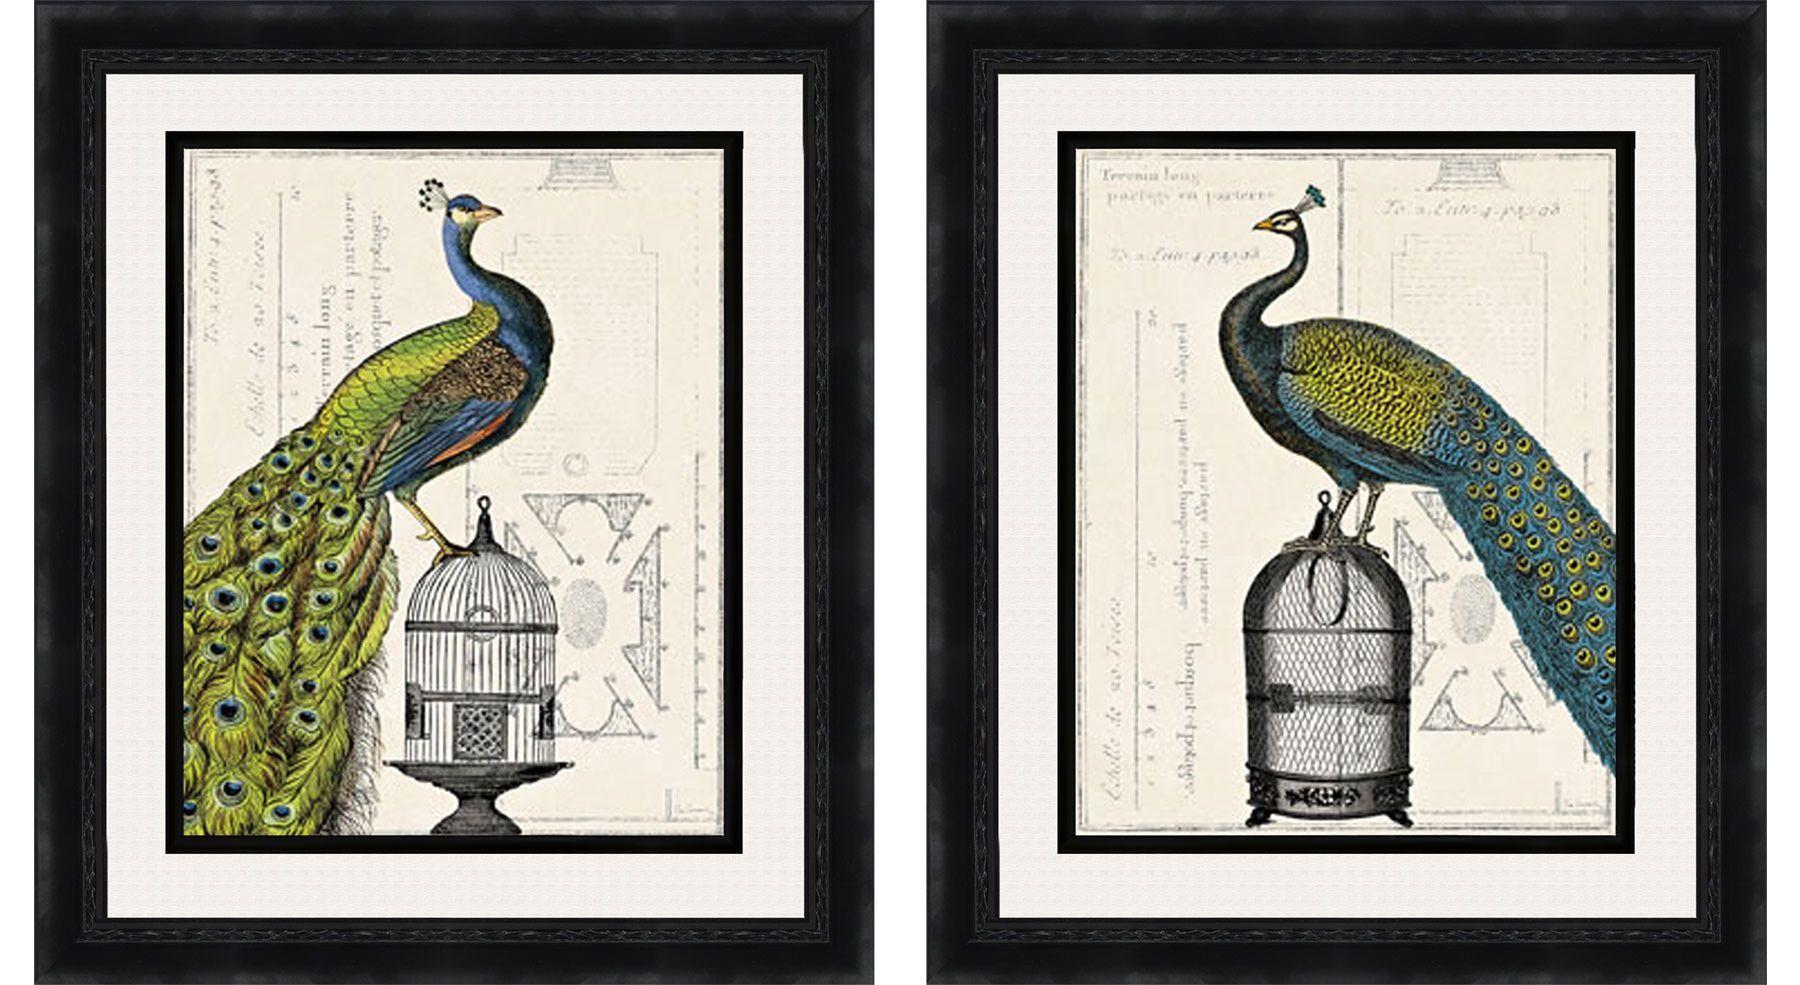 Regal Peacock 2 Piece Framed Painting Print Set